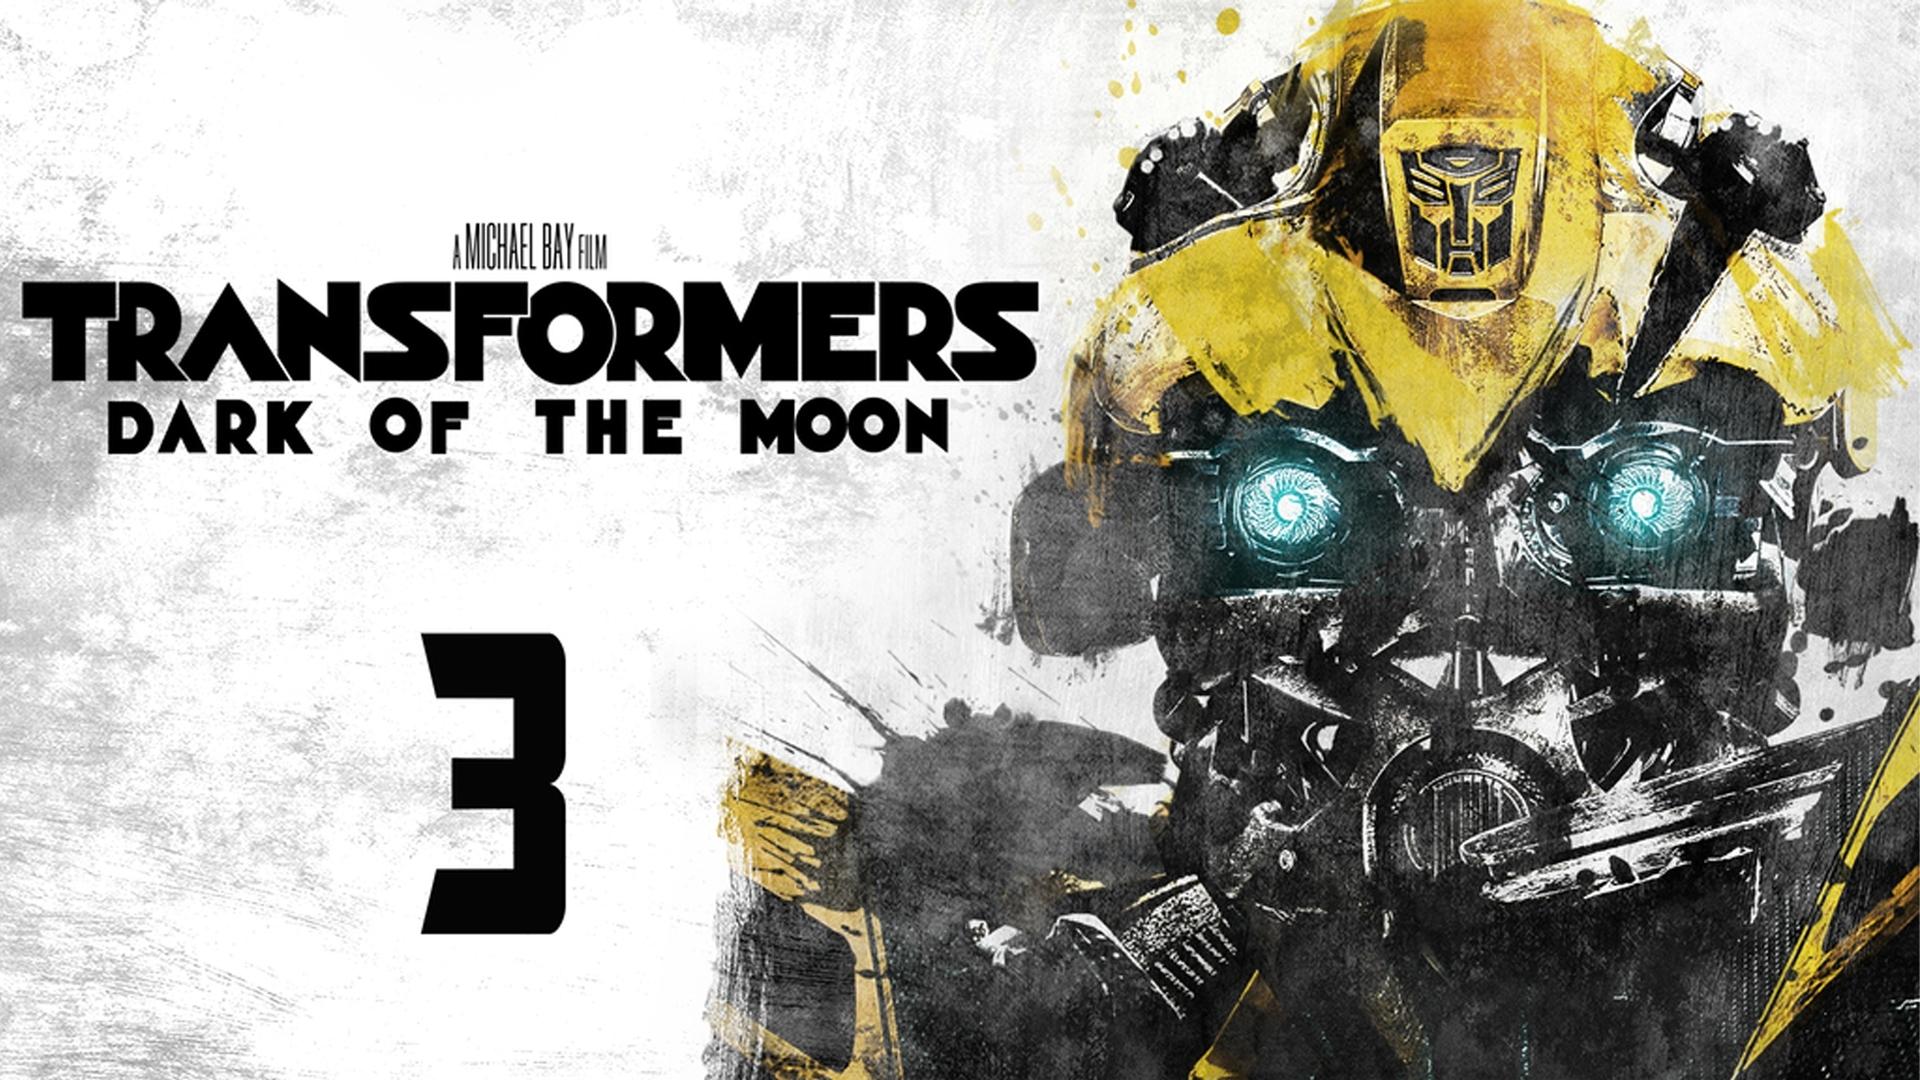 Transformers: Dark of the Moon ทรานส์ฟอร์เมอร์ส ดาร์ค ออฟ เดอะ มูน